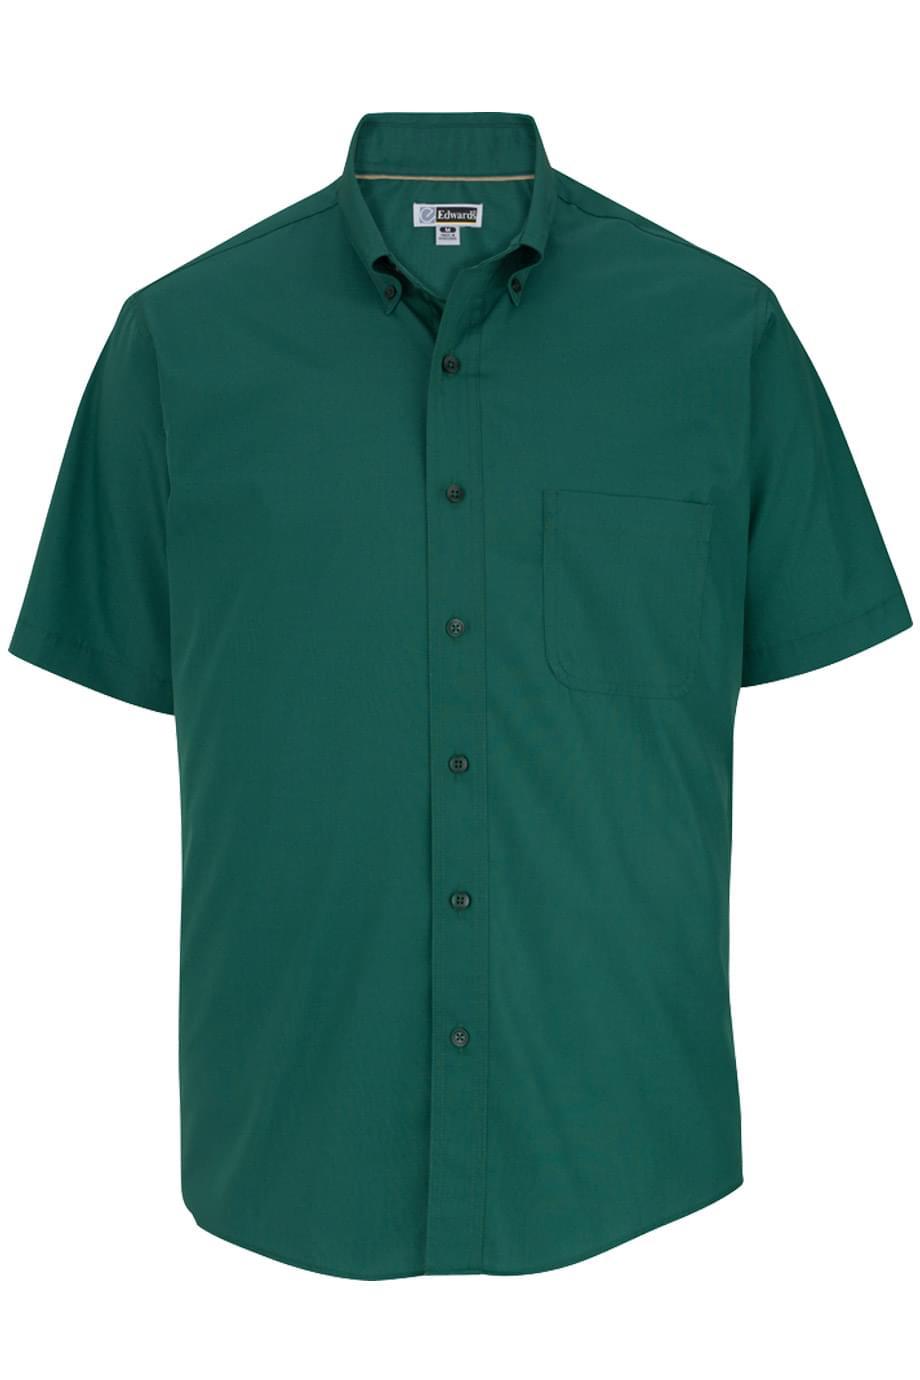 Edwards Garments Men's Short Sleeve Soft Touch Poplin Shirt 1245